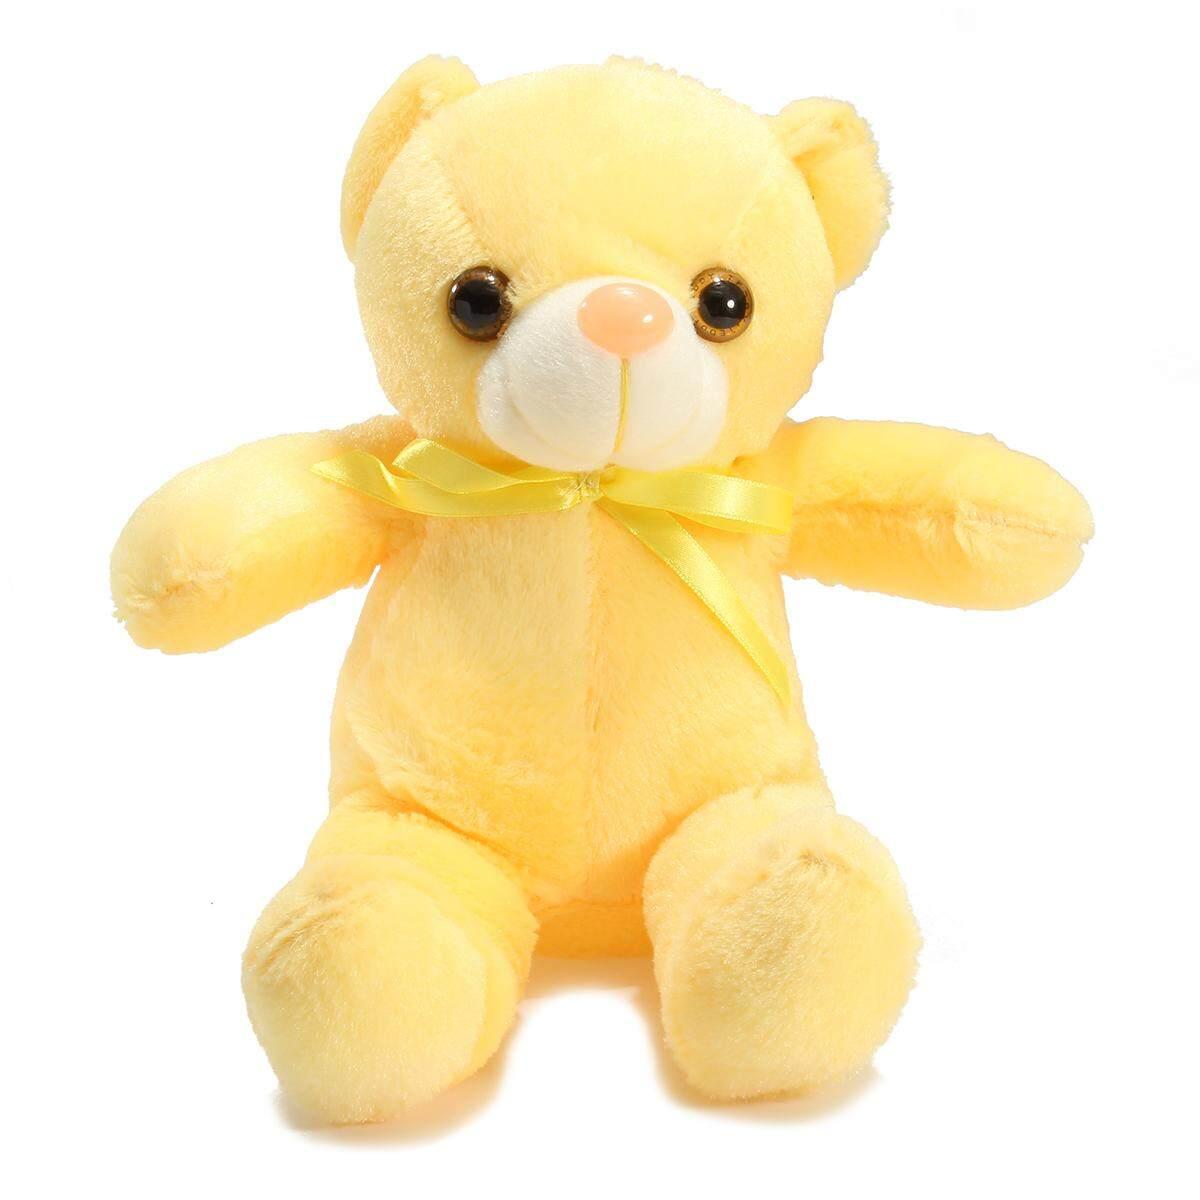 Boneka Shaun Hug Me Please Hijau Page 4 Daftar Update Harga Terbaru Indonesia. Source · 2017 LED Flash Teddy Bear Stuffed Animals Plush Soft Hug Toy Baby ...